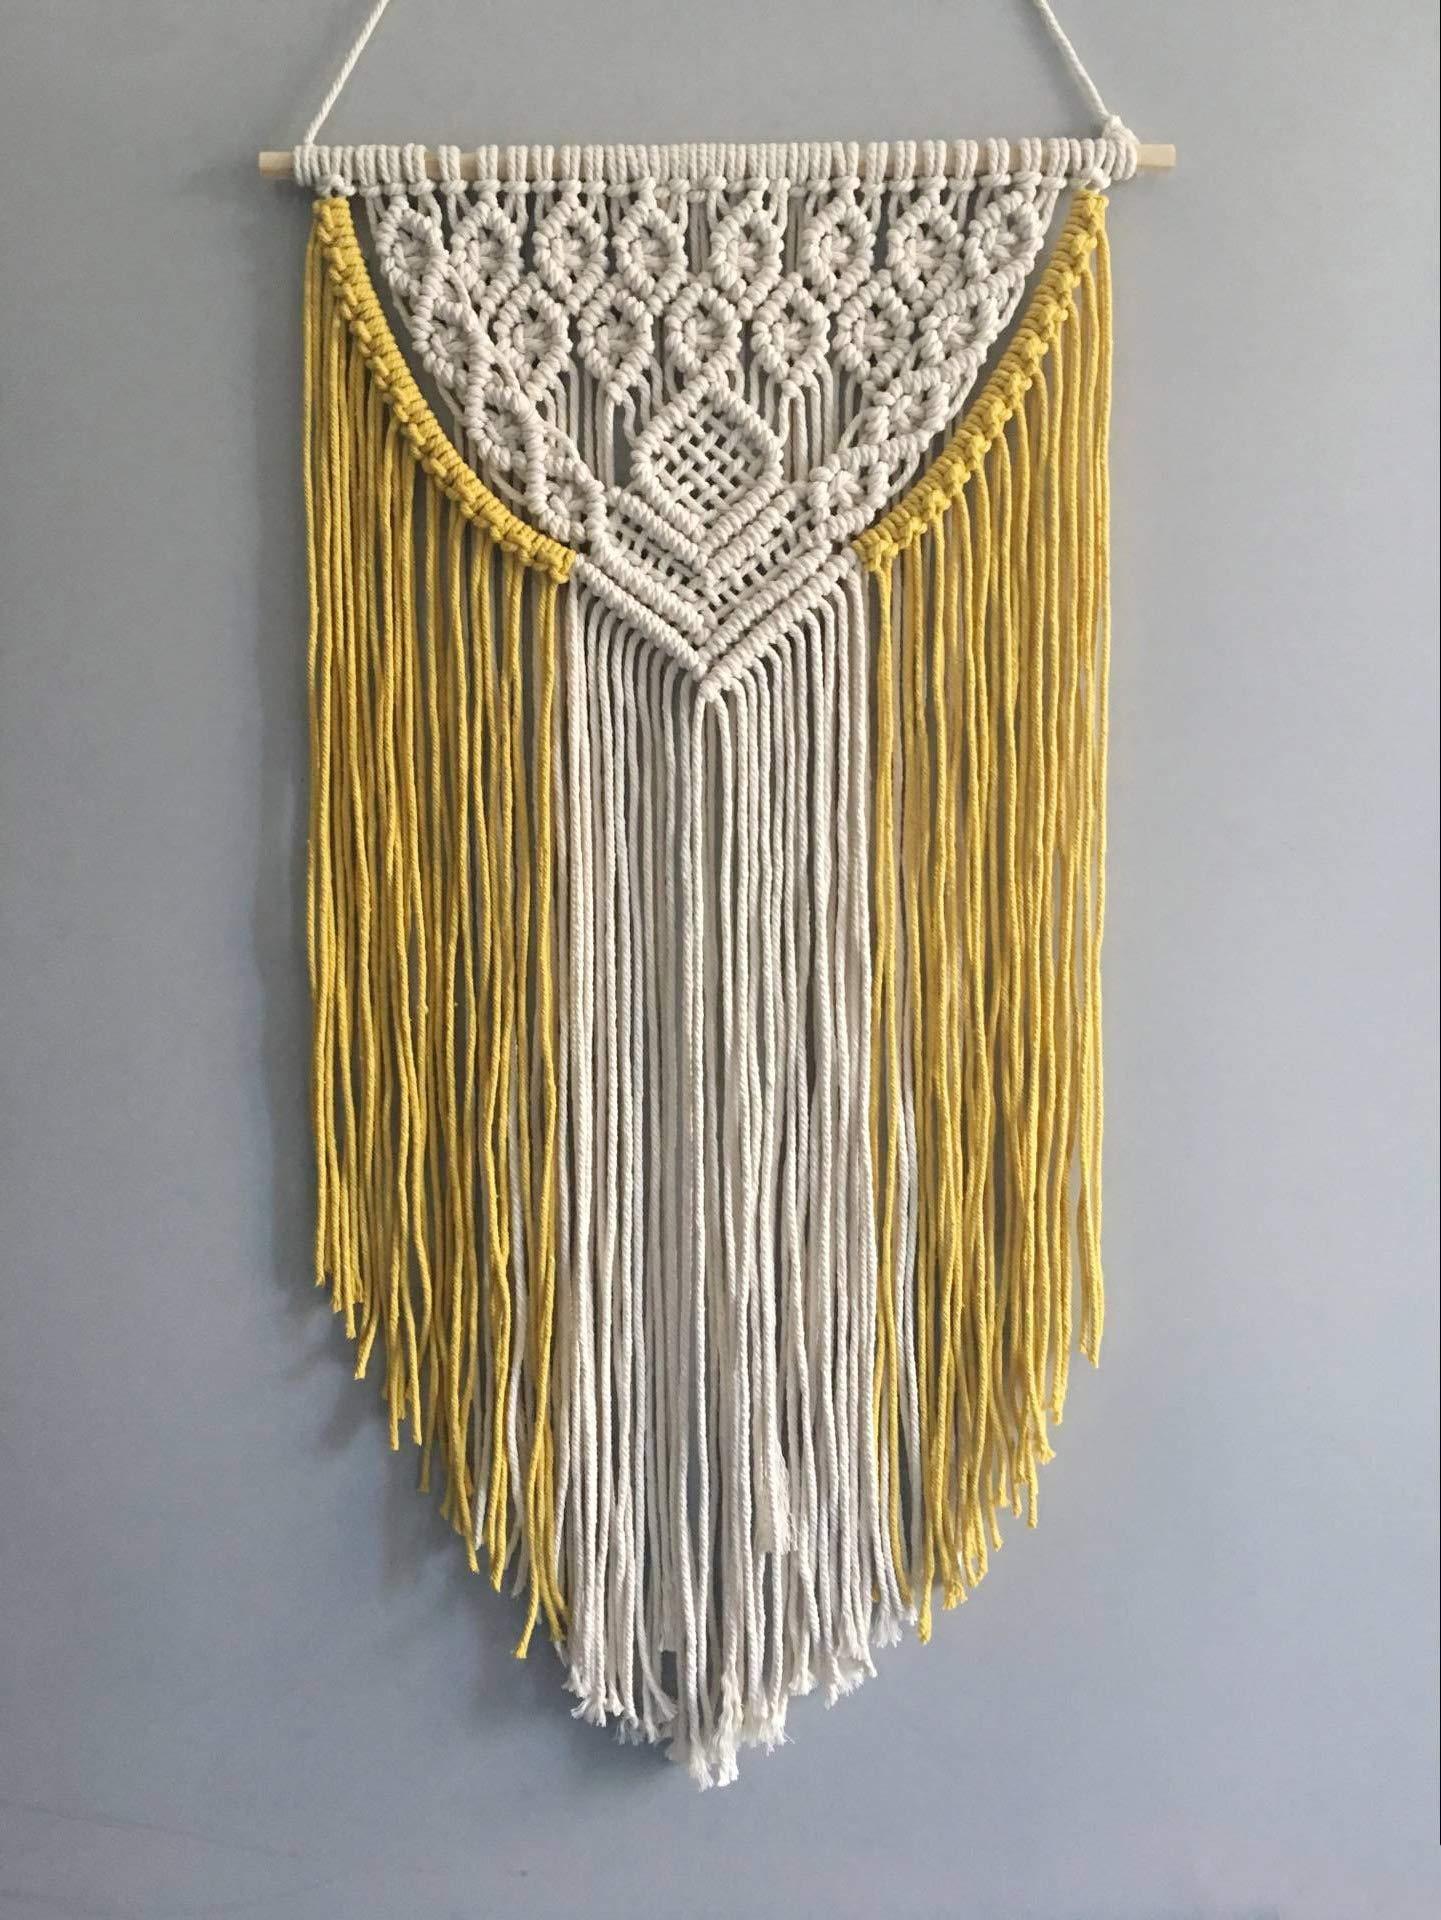 Youngeast Handmade Boho Macrame Wall Hanging Woven Craftmanship 16.9 x 30 Inches Yellow